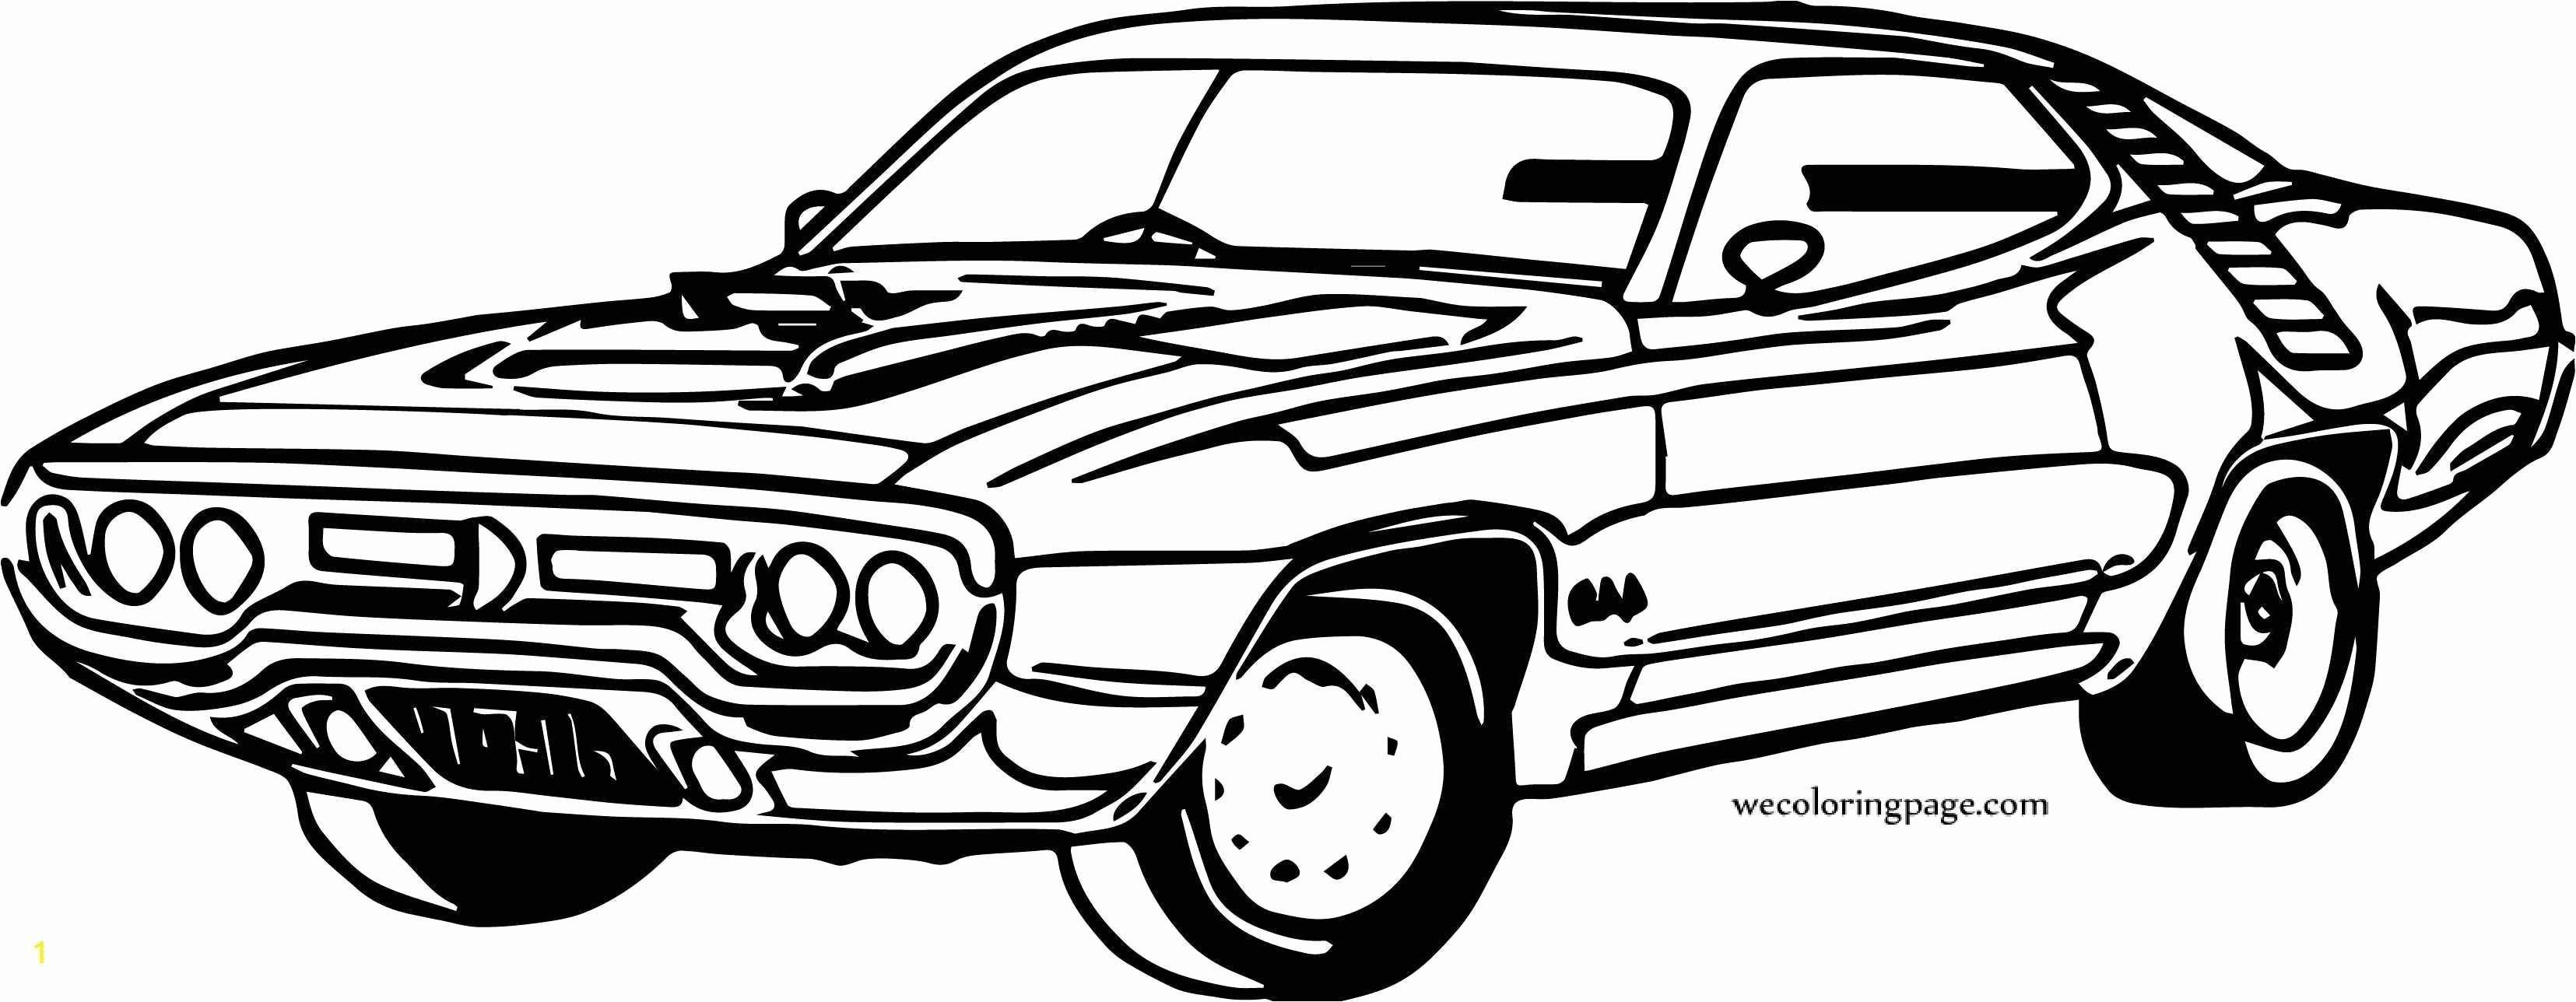 Car Drawing Book Kids Unique Unique Dodge Car Coloring Pages Sirclaymelon In 2020 Cars Coloring Pages Sports Coloring Pages Monster Truck Coloring Pages